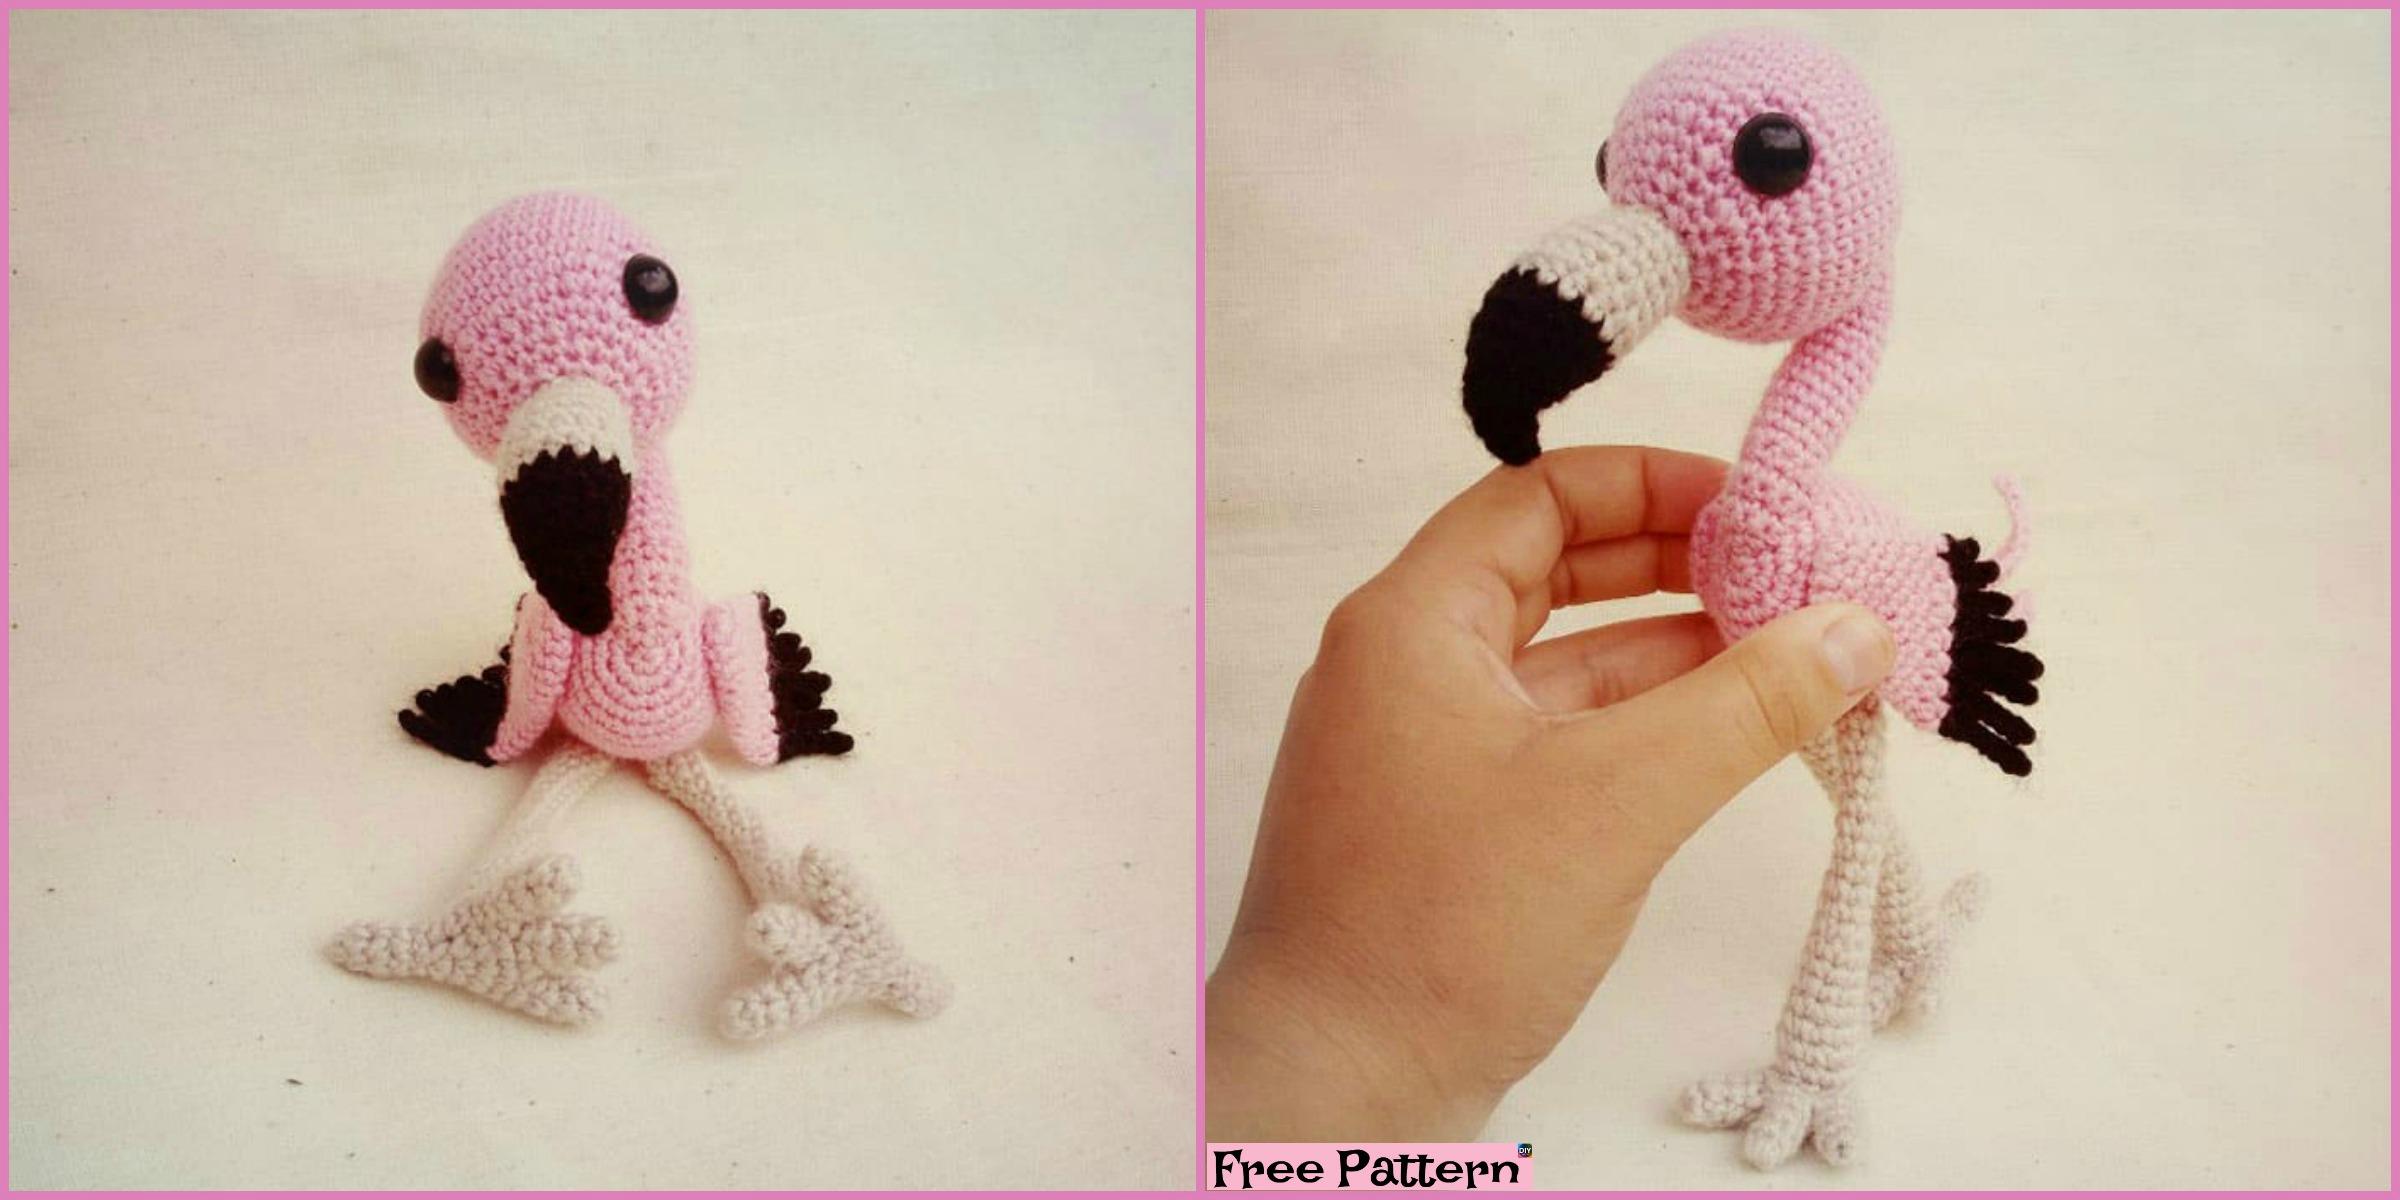 Crochet Baby Flamingo Amigurumi – Free Pattern